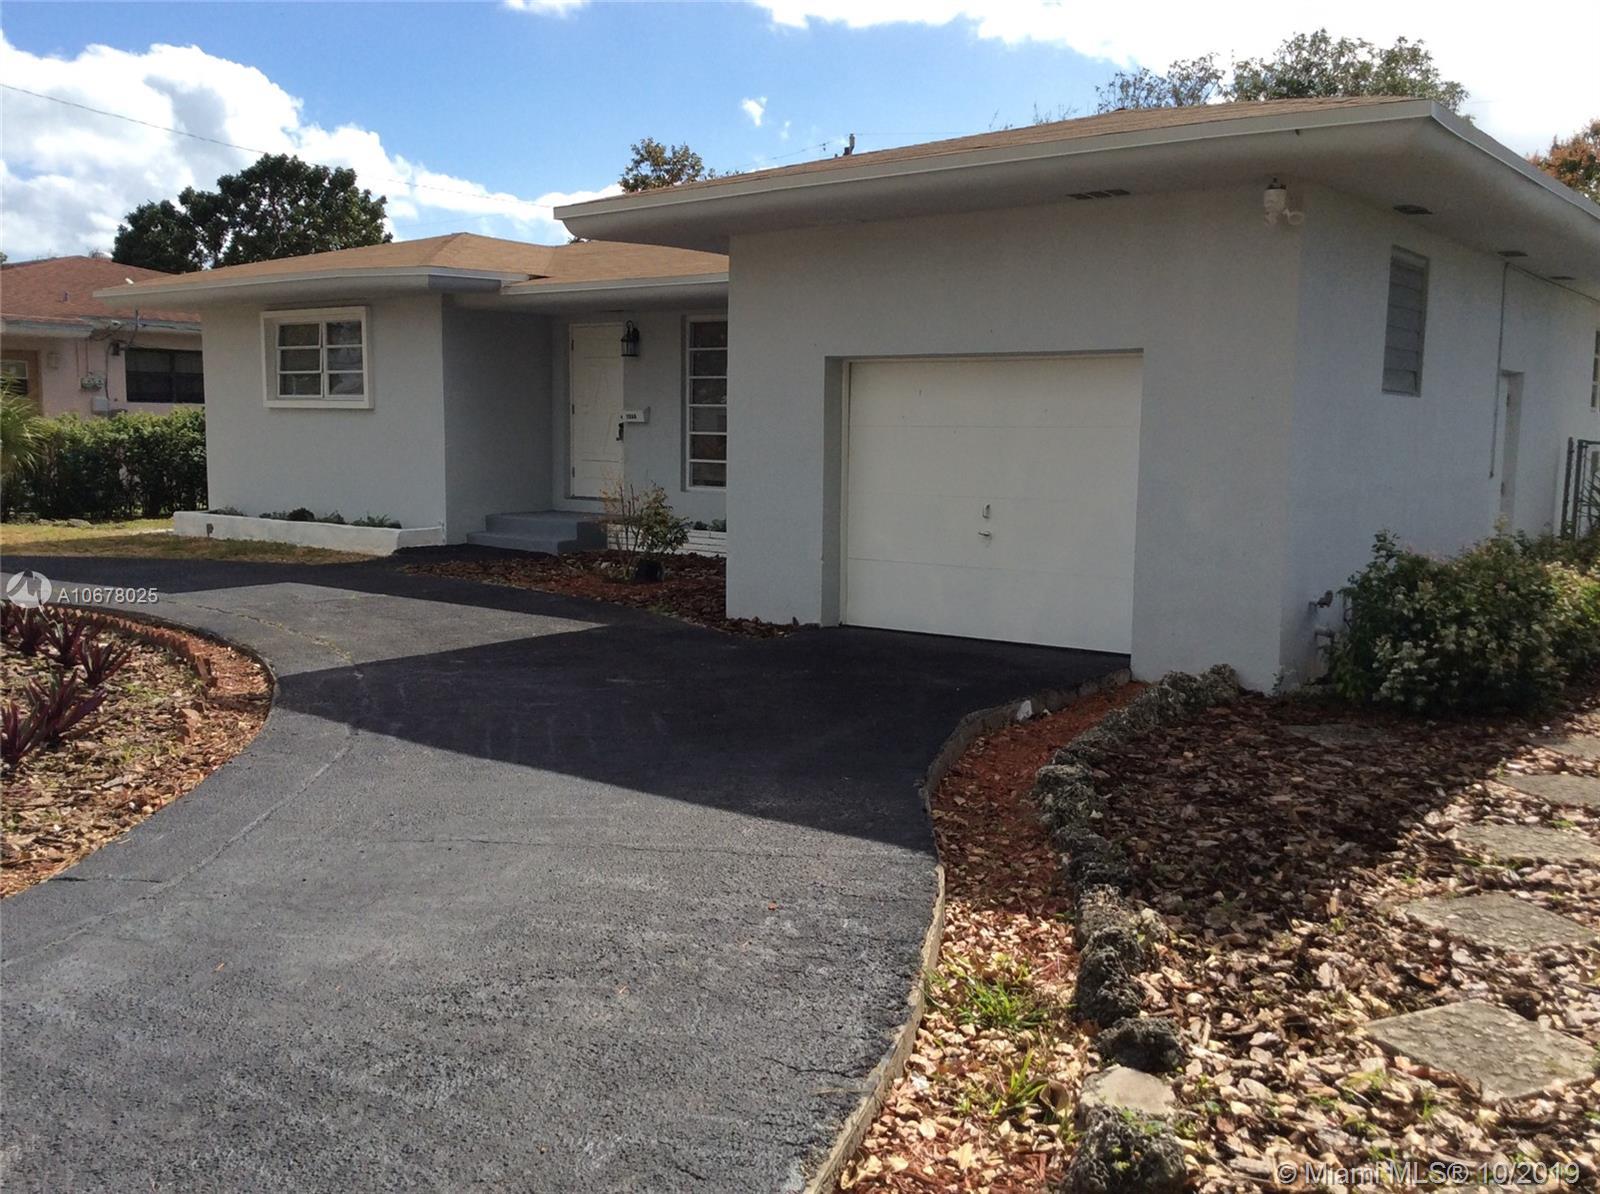 1060 NE 166th St, Miami Shores, Florida